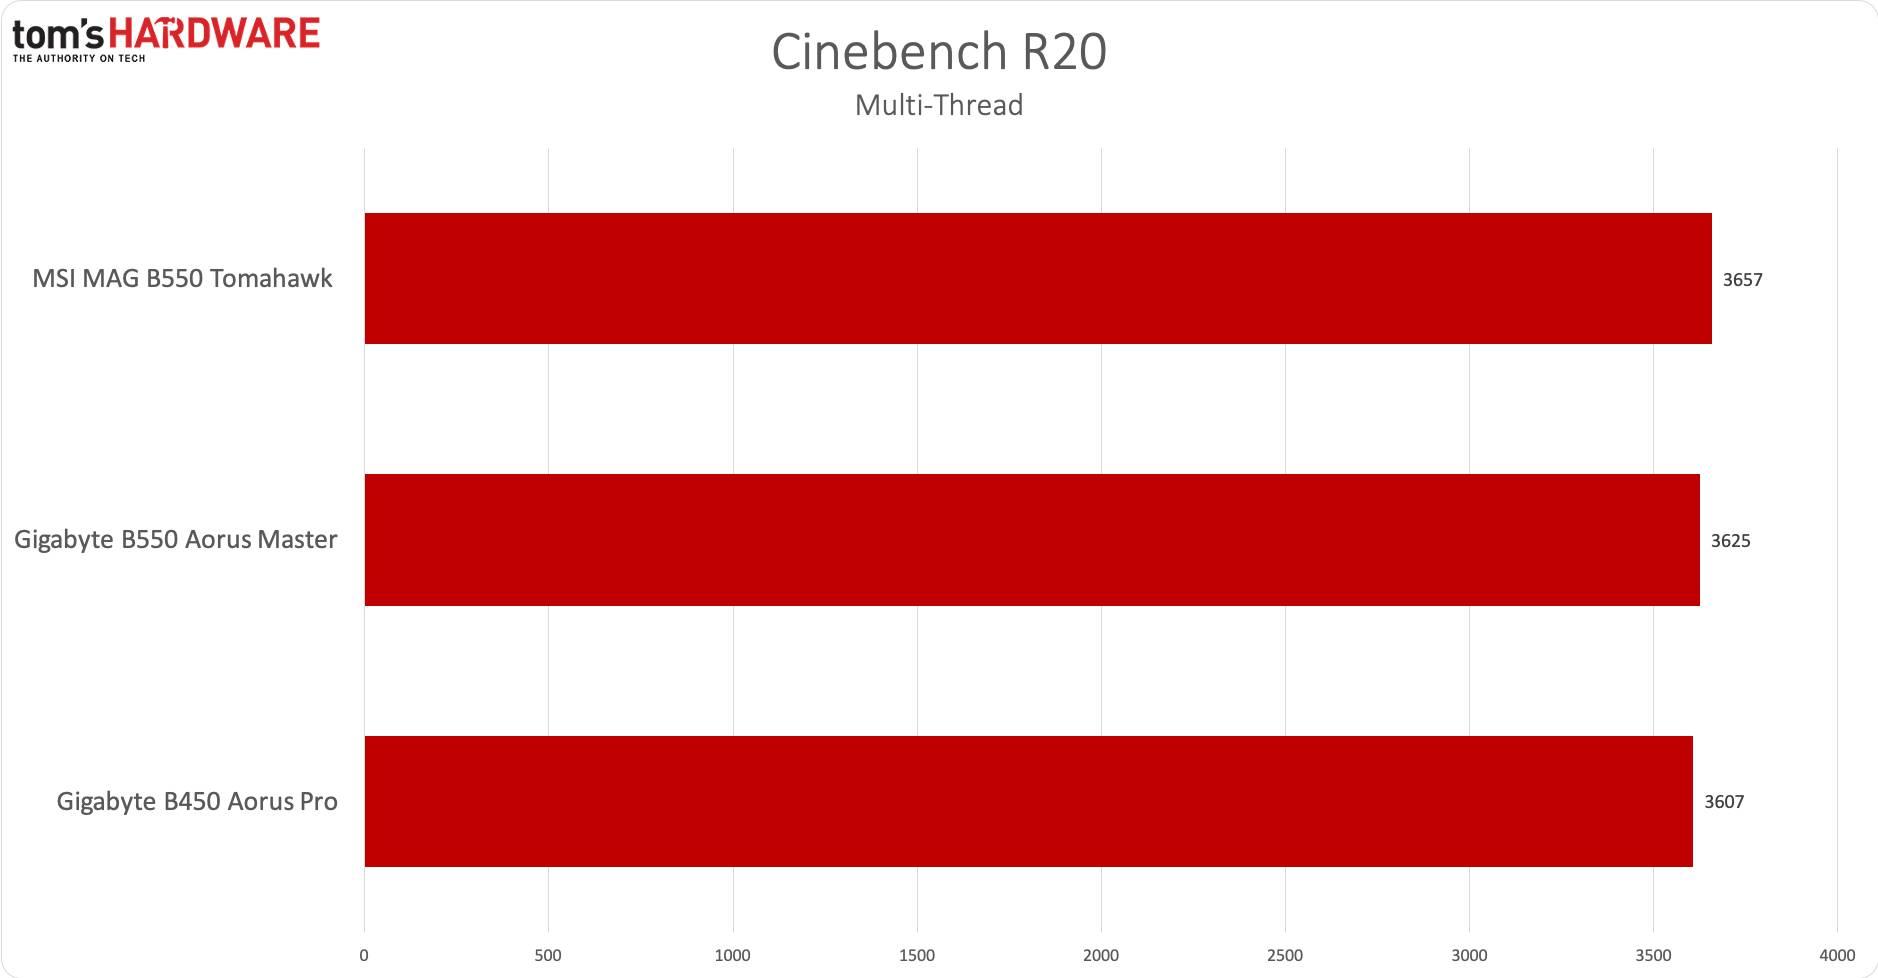 AMD B550 - CBR20 multi